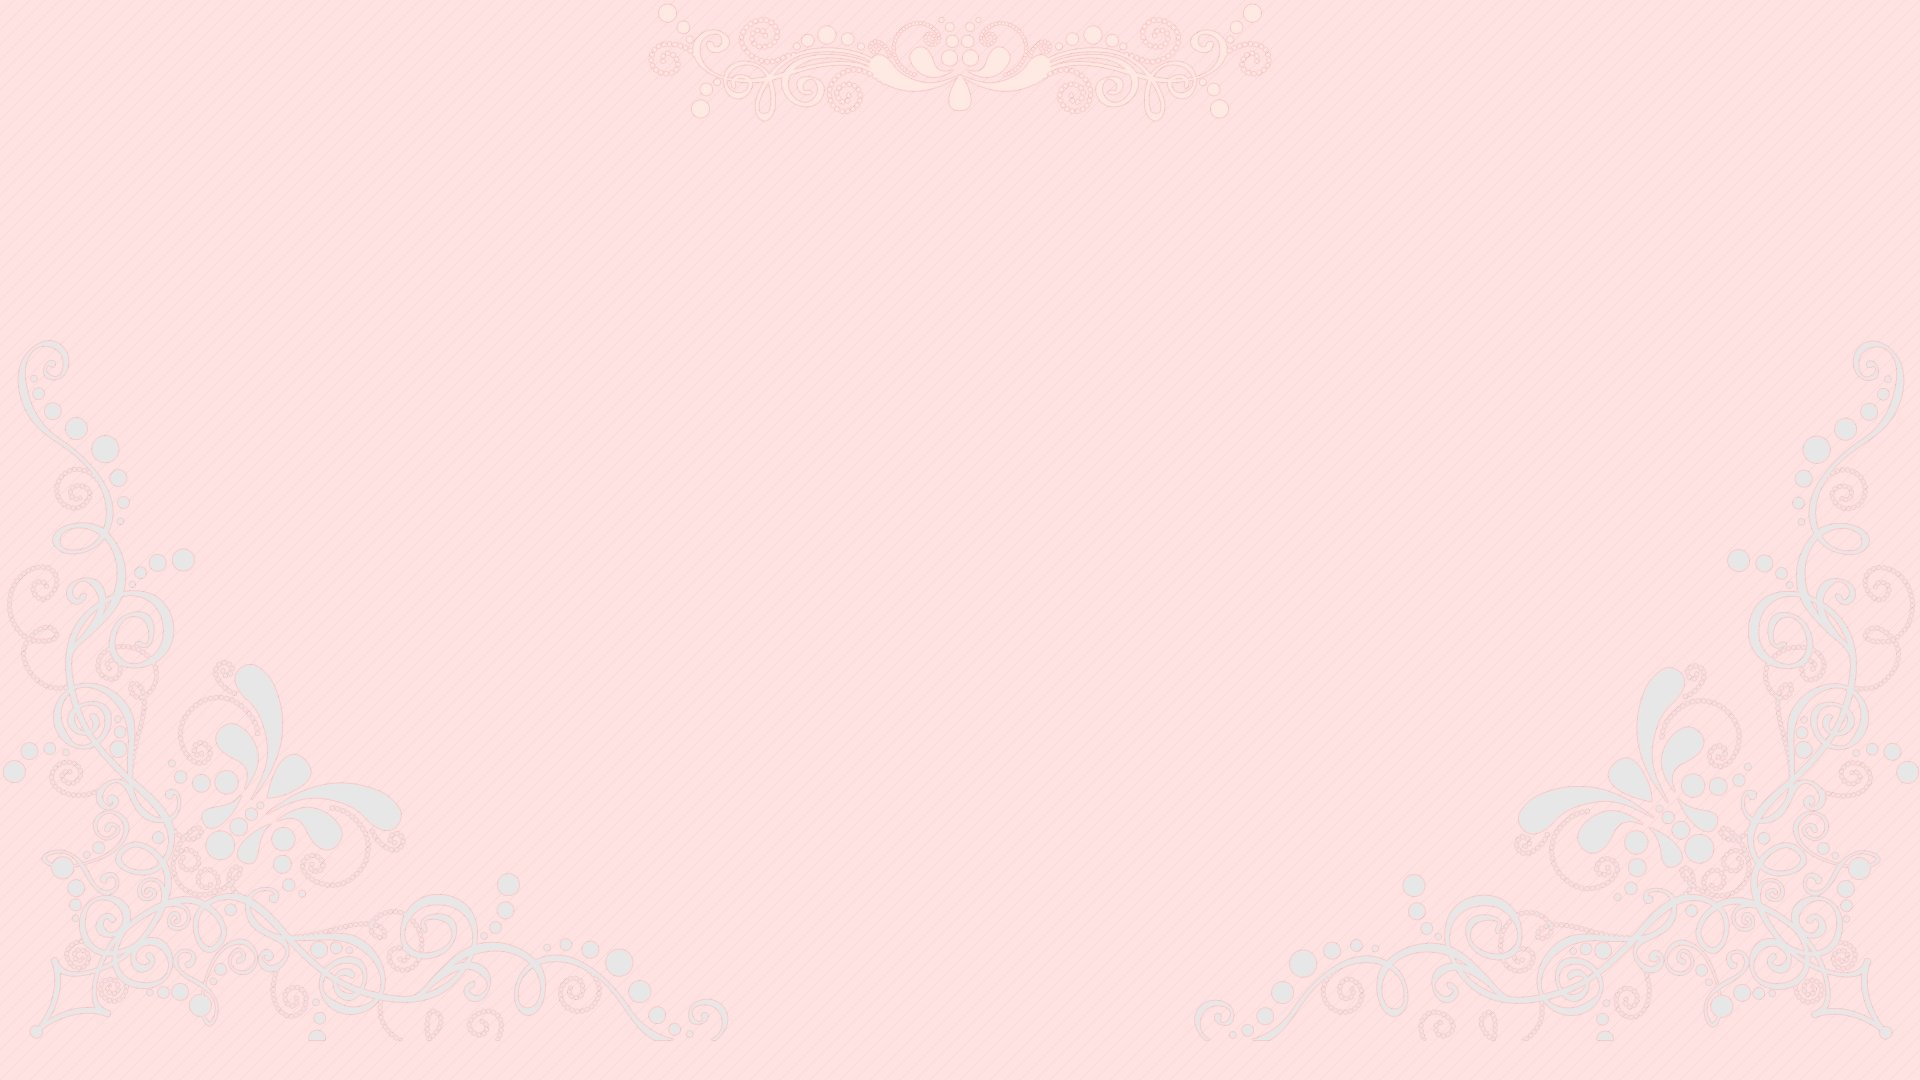 Pastel Aesthetic Wallpaper Desktop